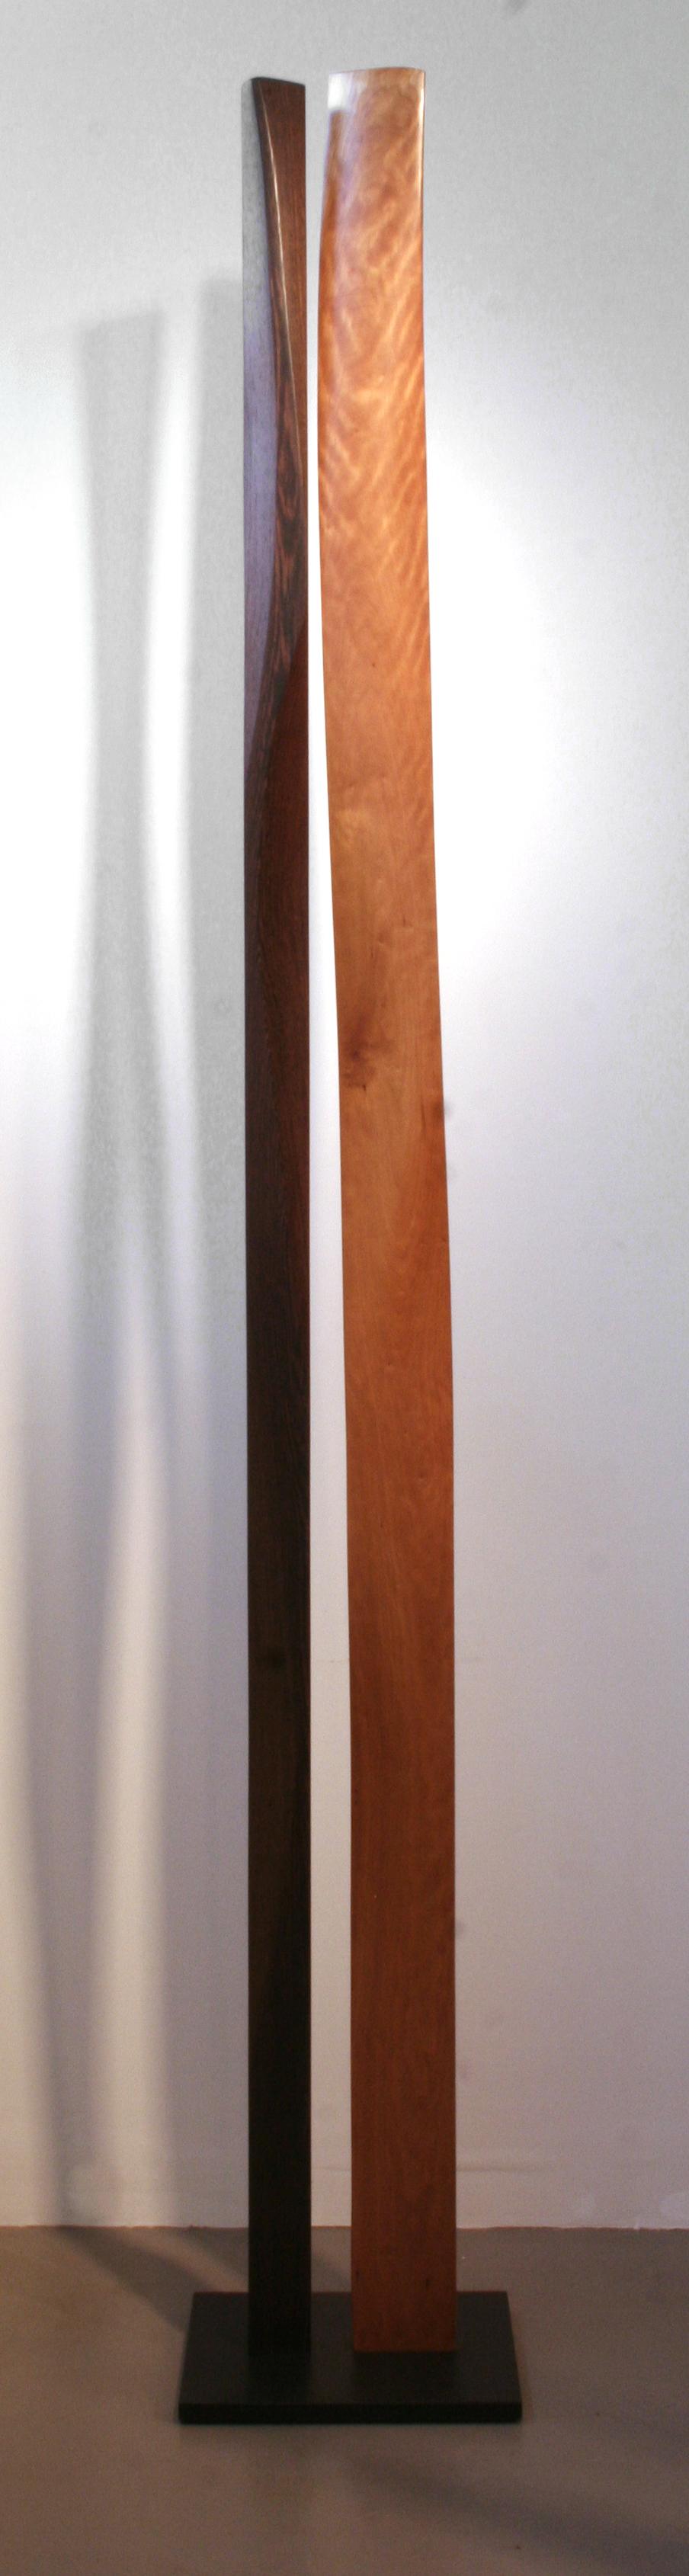 "John Schwarzkopf ""Gracious Duo,"" 2009 paperstone, cherry, wenge 97"" x 14"" 12"""